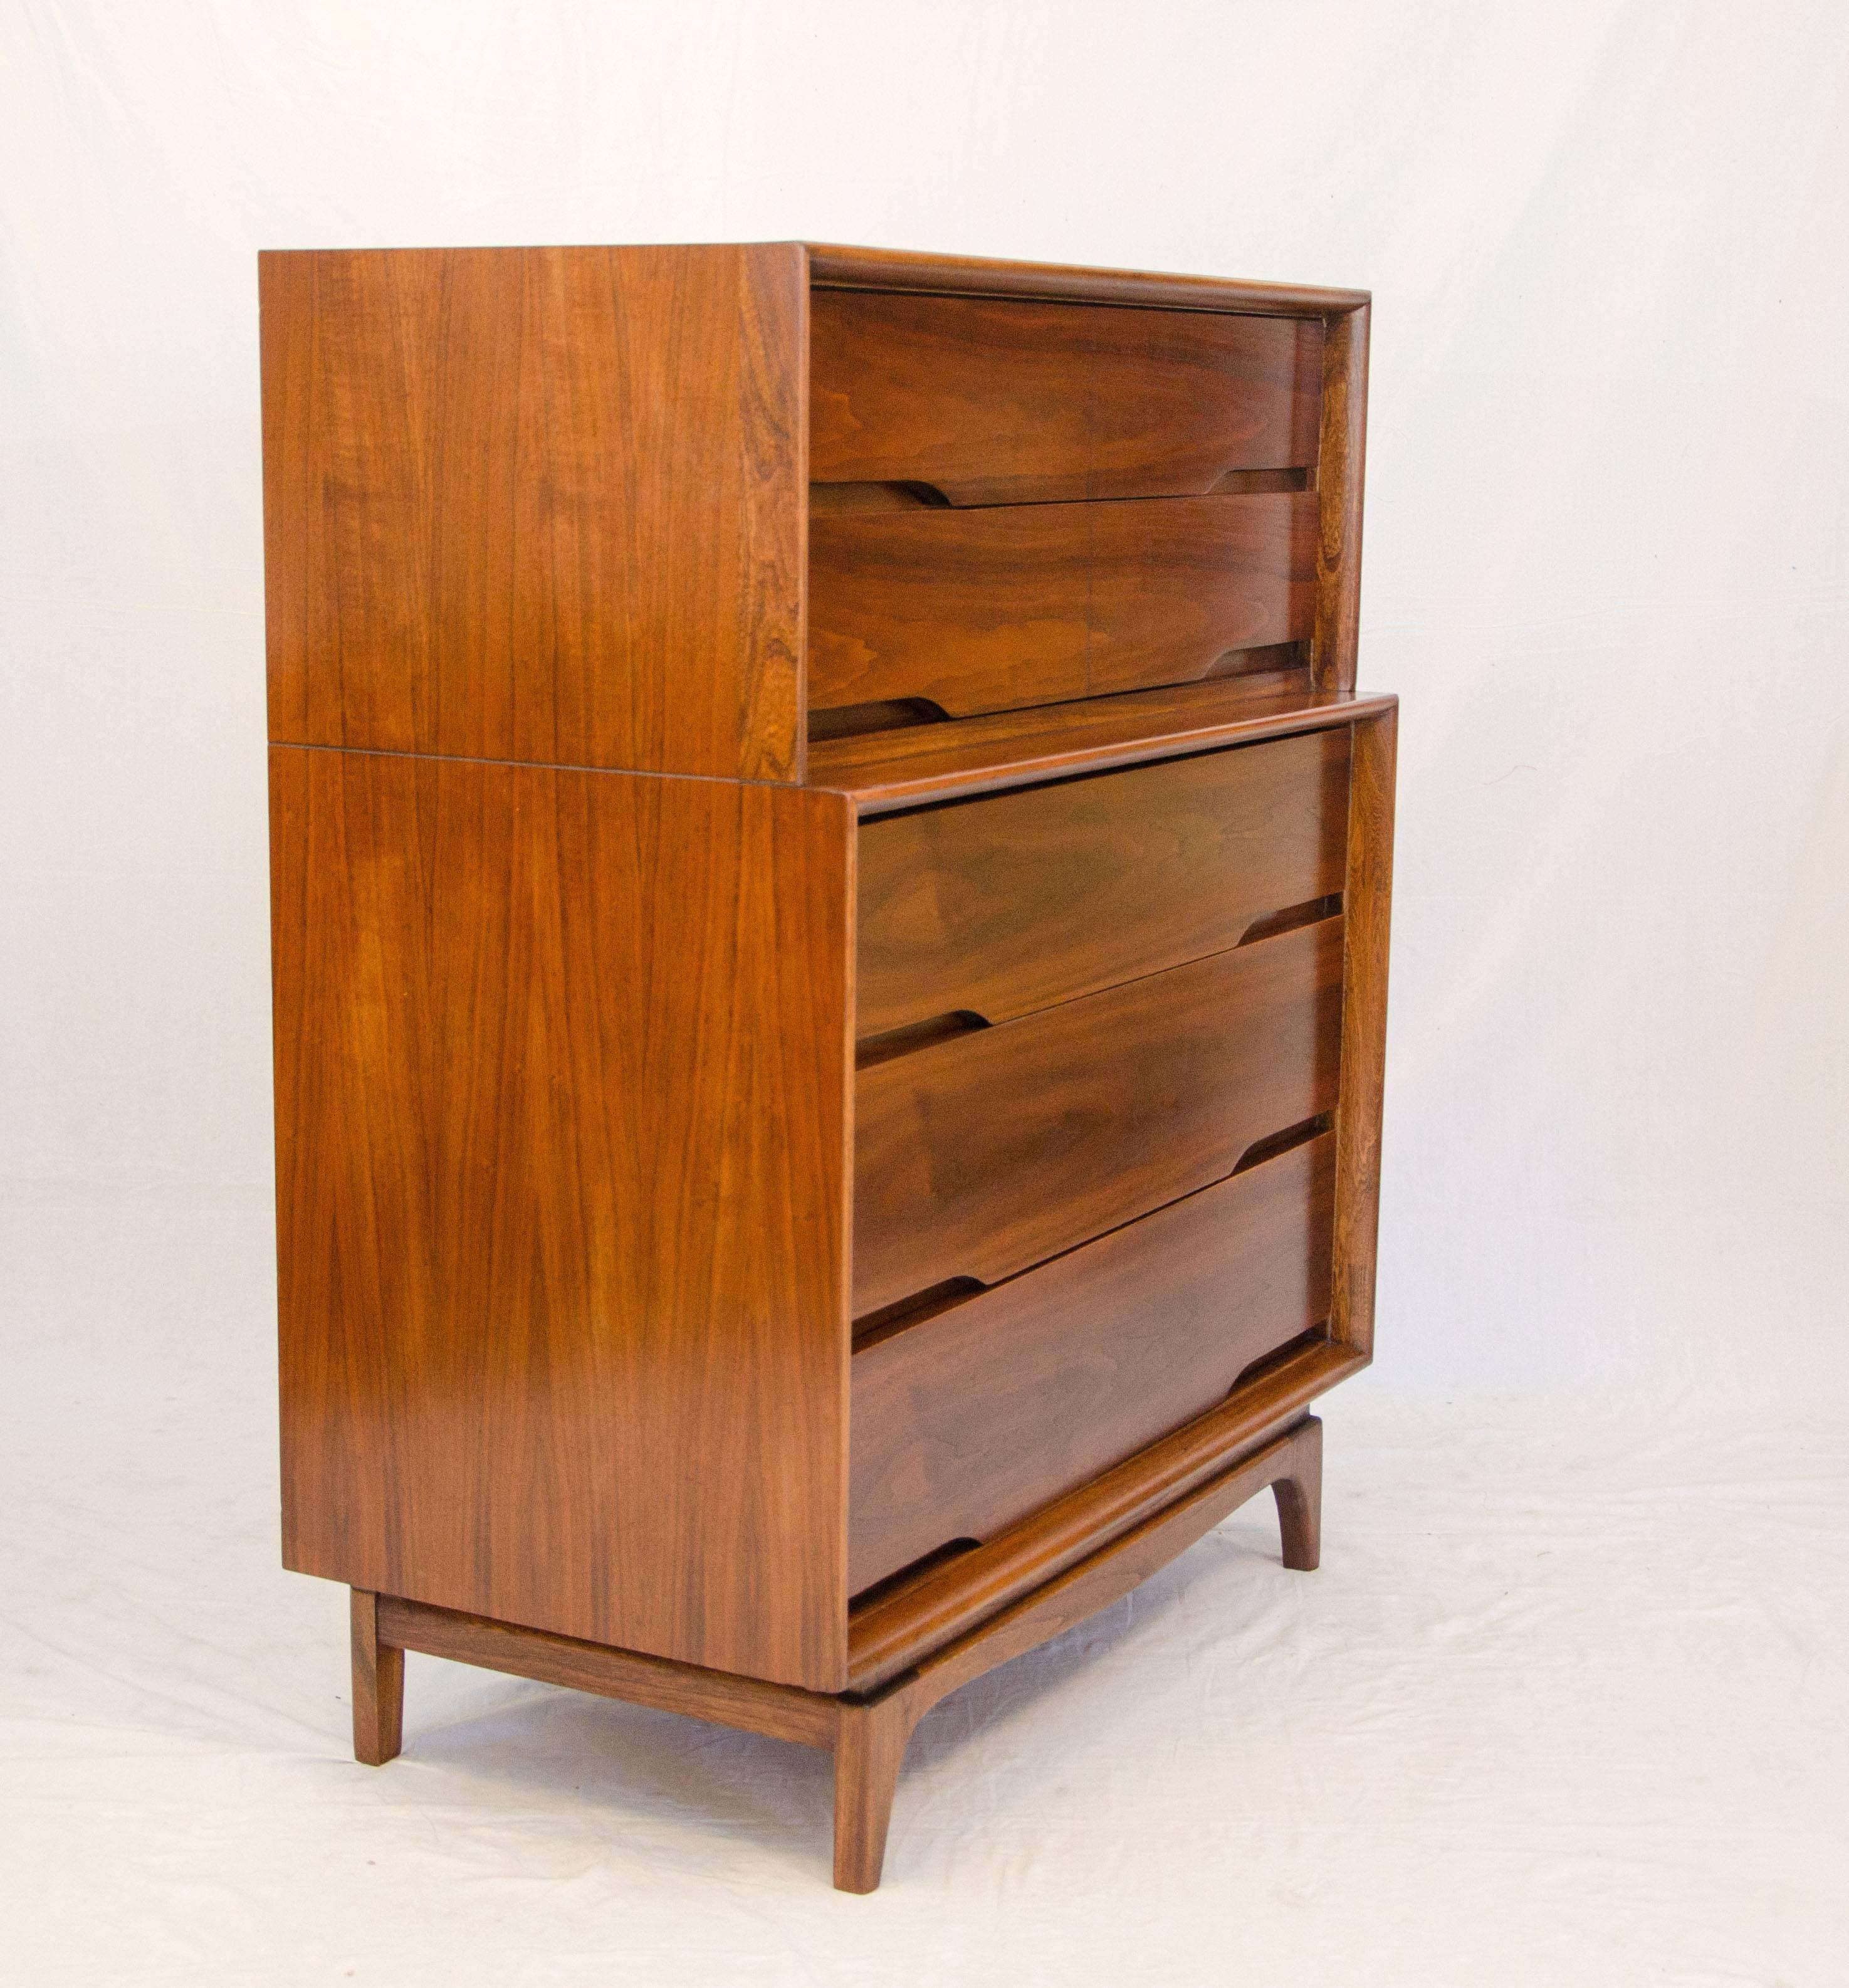 drawers of seewetterbericht vs mahogany info chest highboy